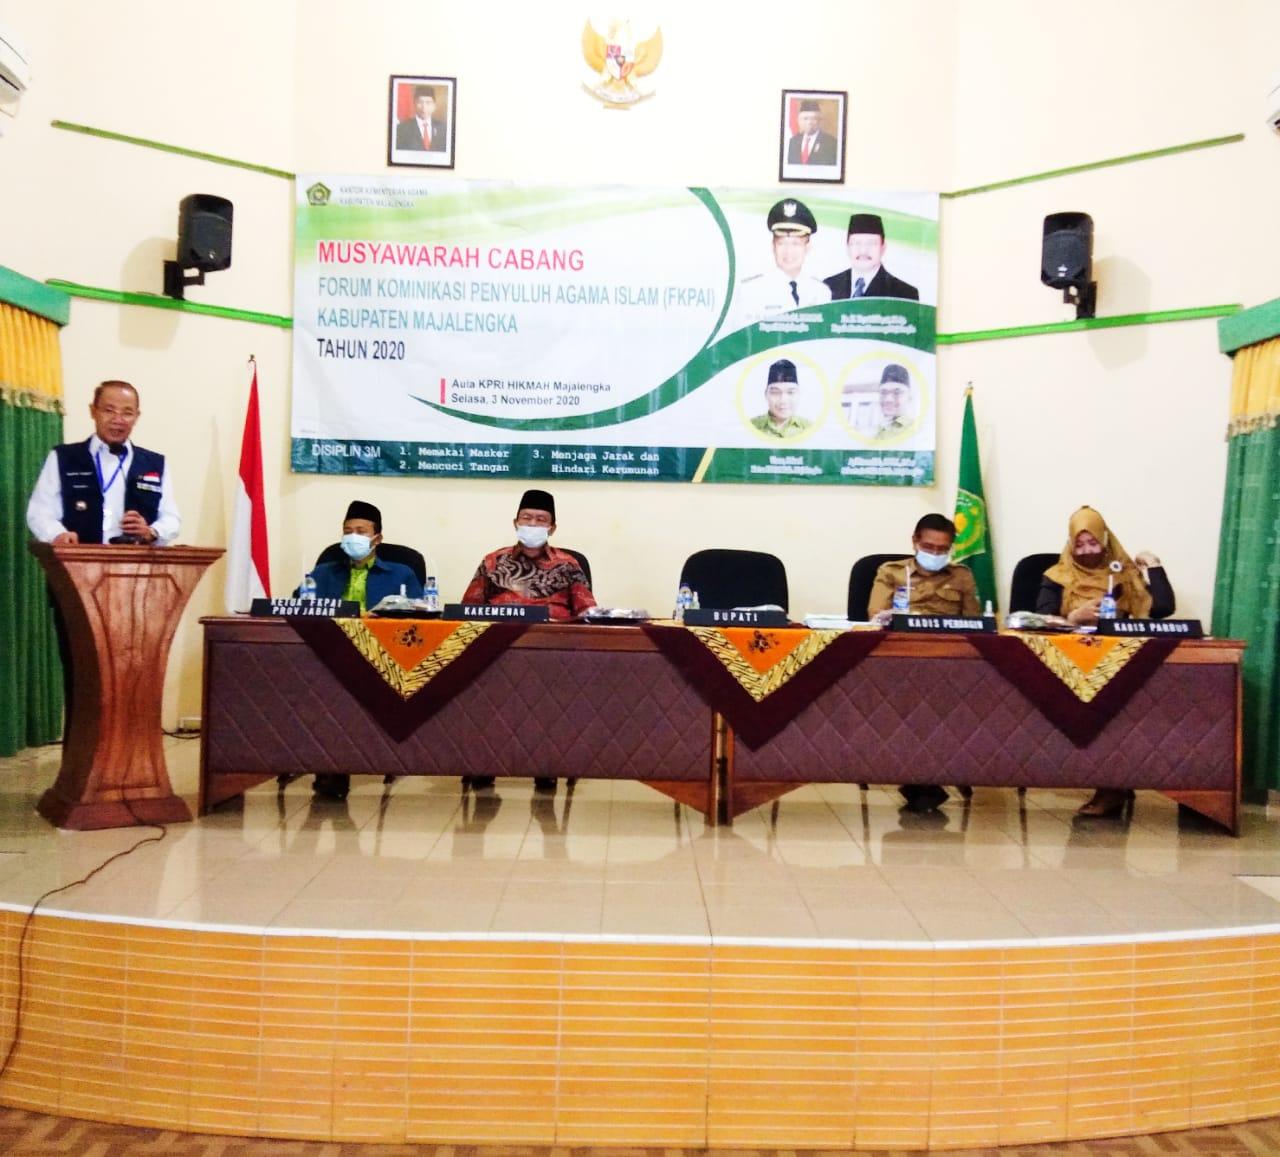 Bupati Hadiri Muscab Forum Komunikasi Penyuluh Agama Islam